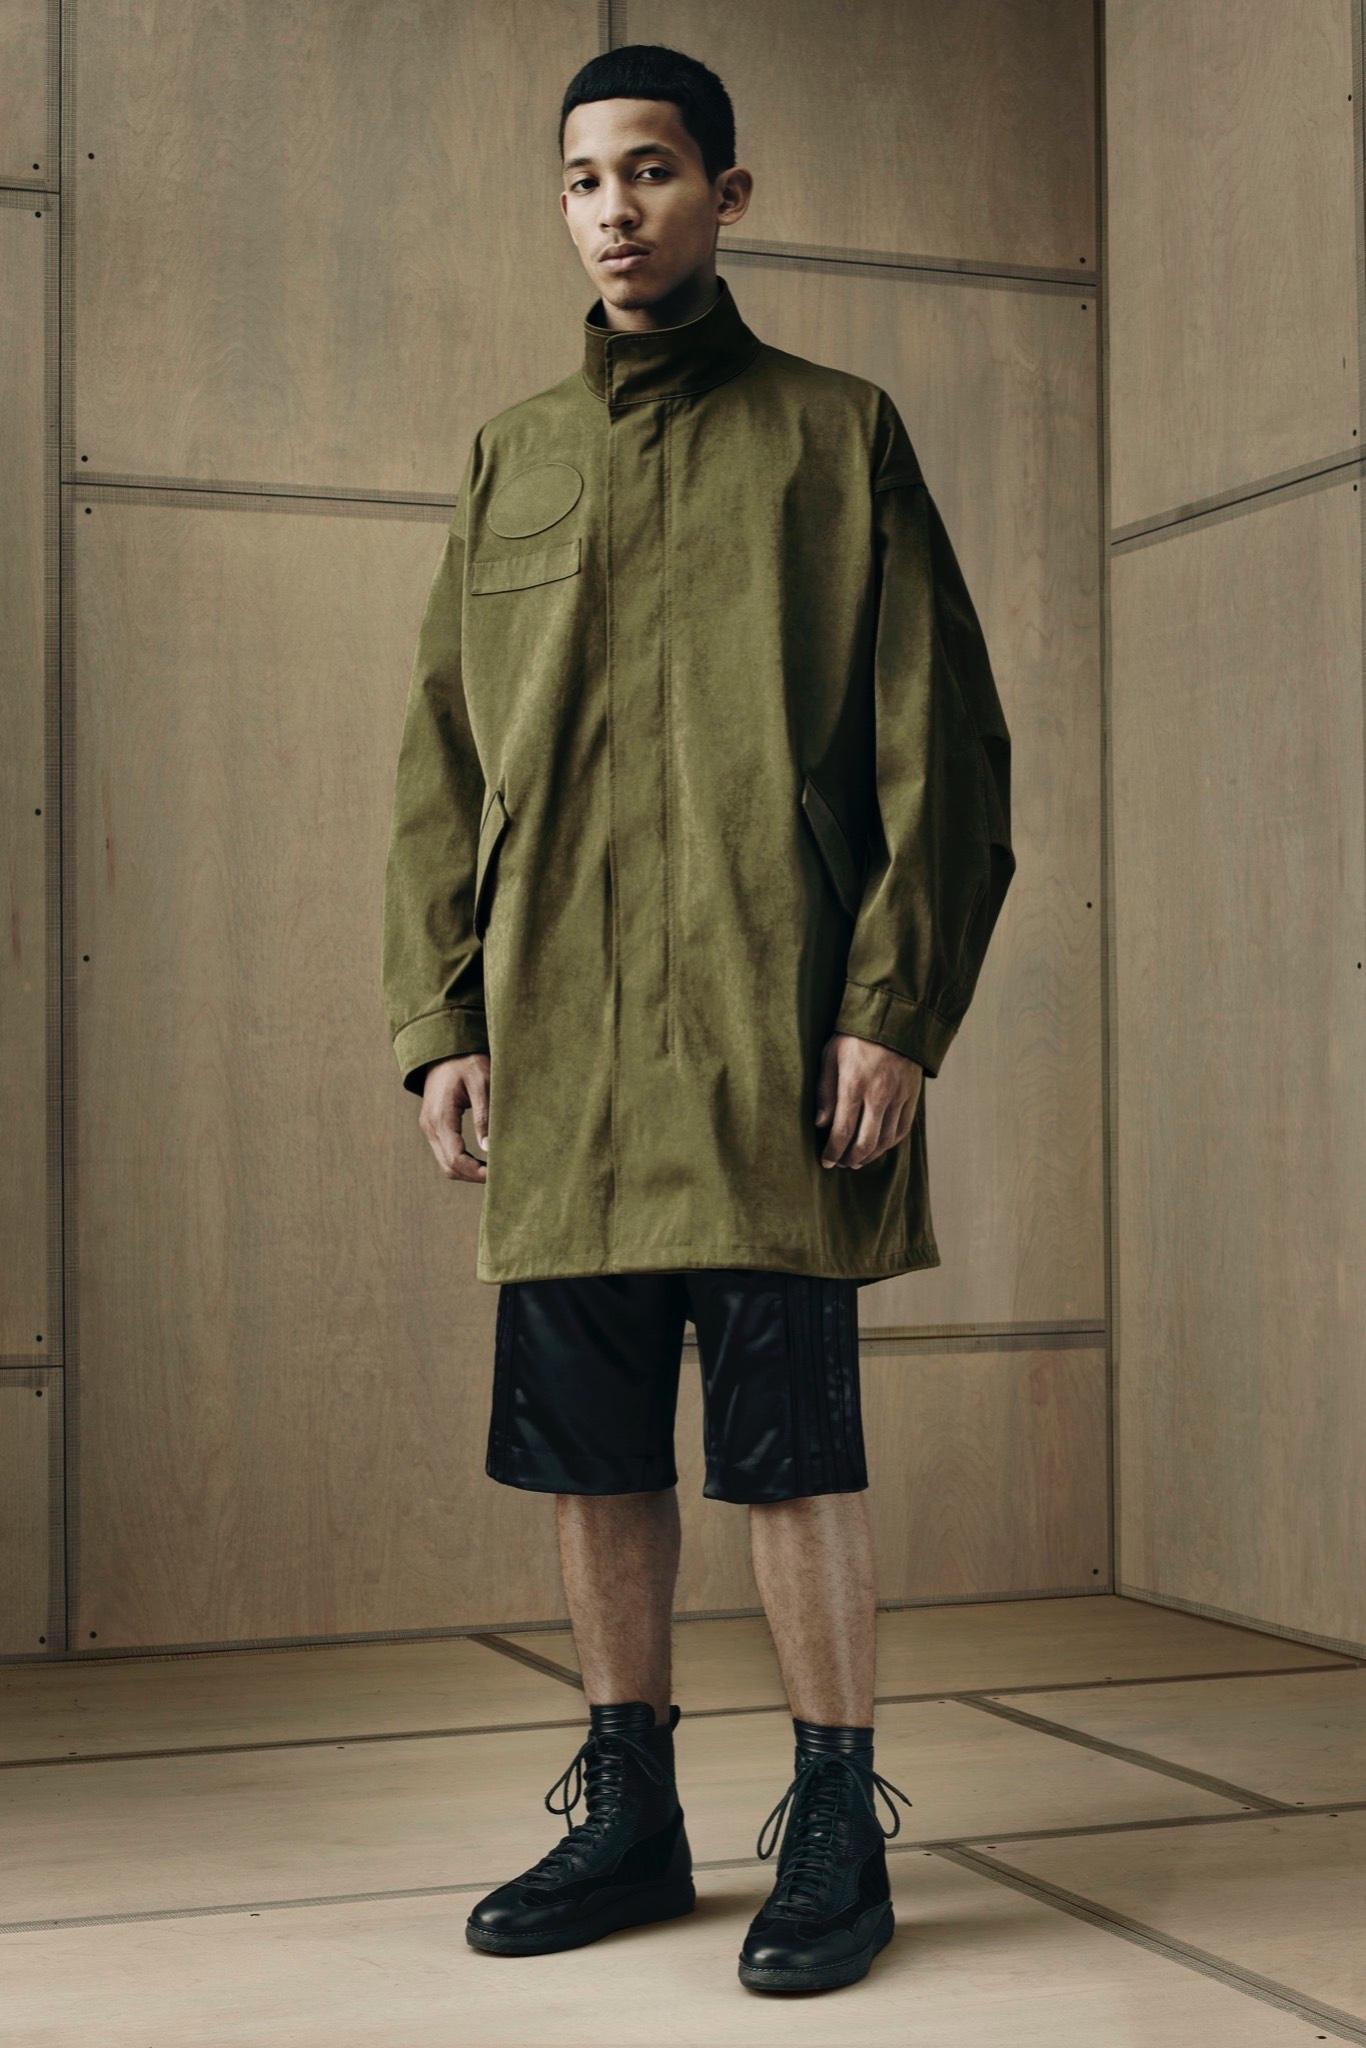 Alexander Wang Spring/Summer 2016 Menswear Collection | Paris Fashion Week